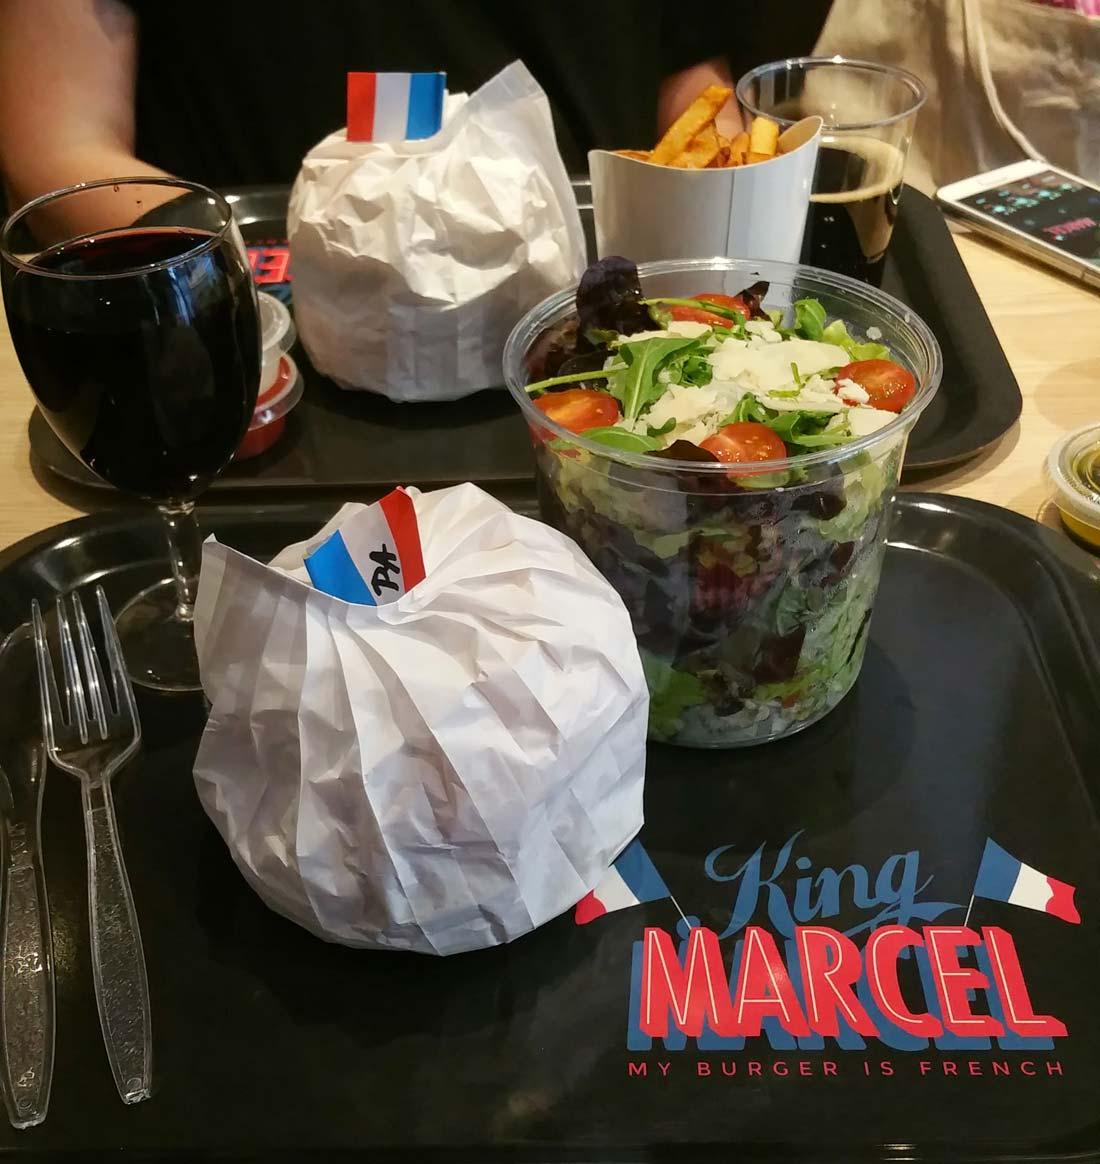 Burgers du king marcel